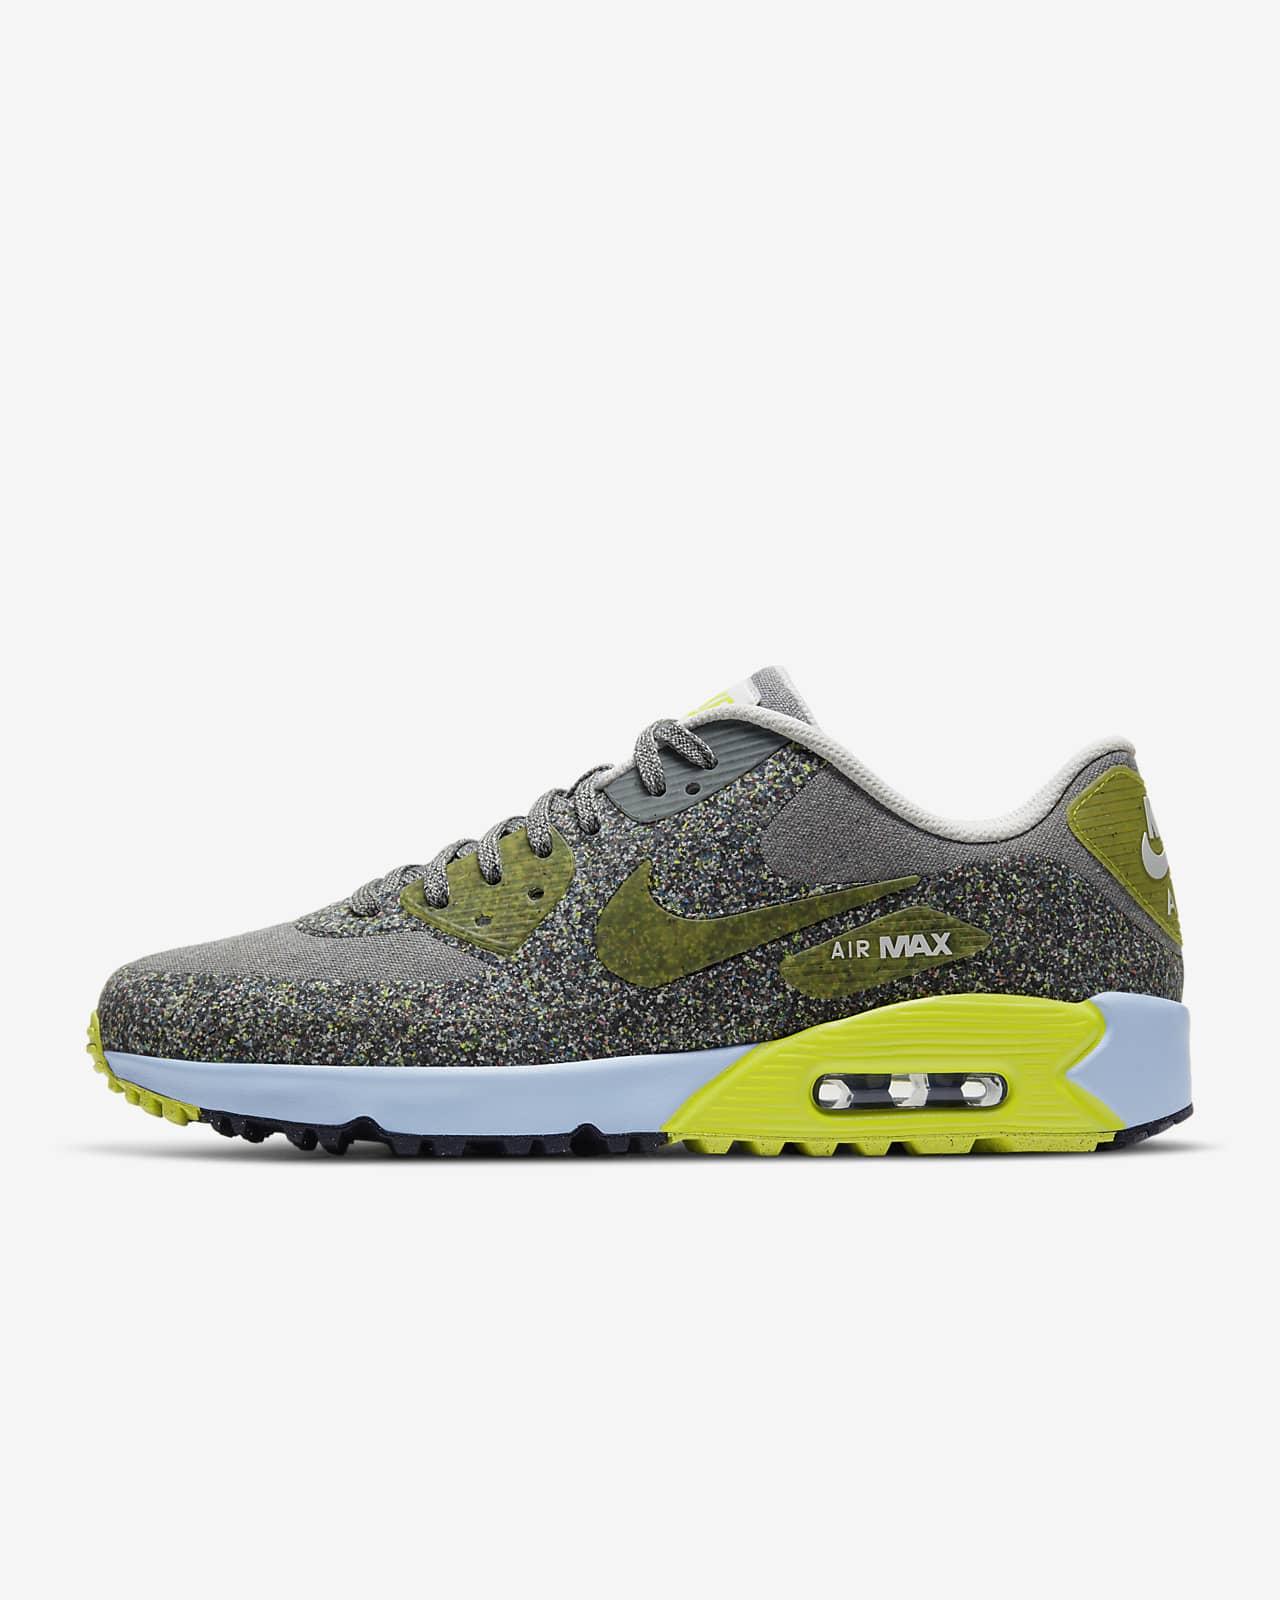 Buty do golfa Nike Air Max 90 G NRG